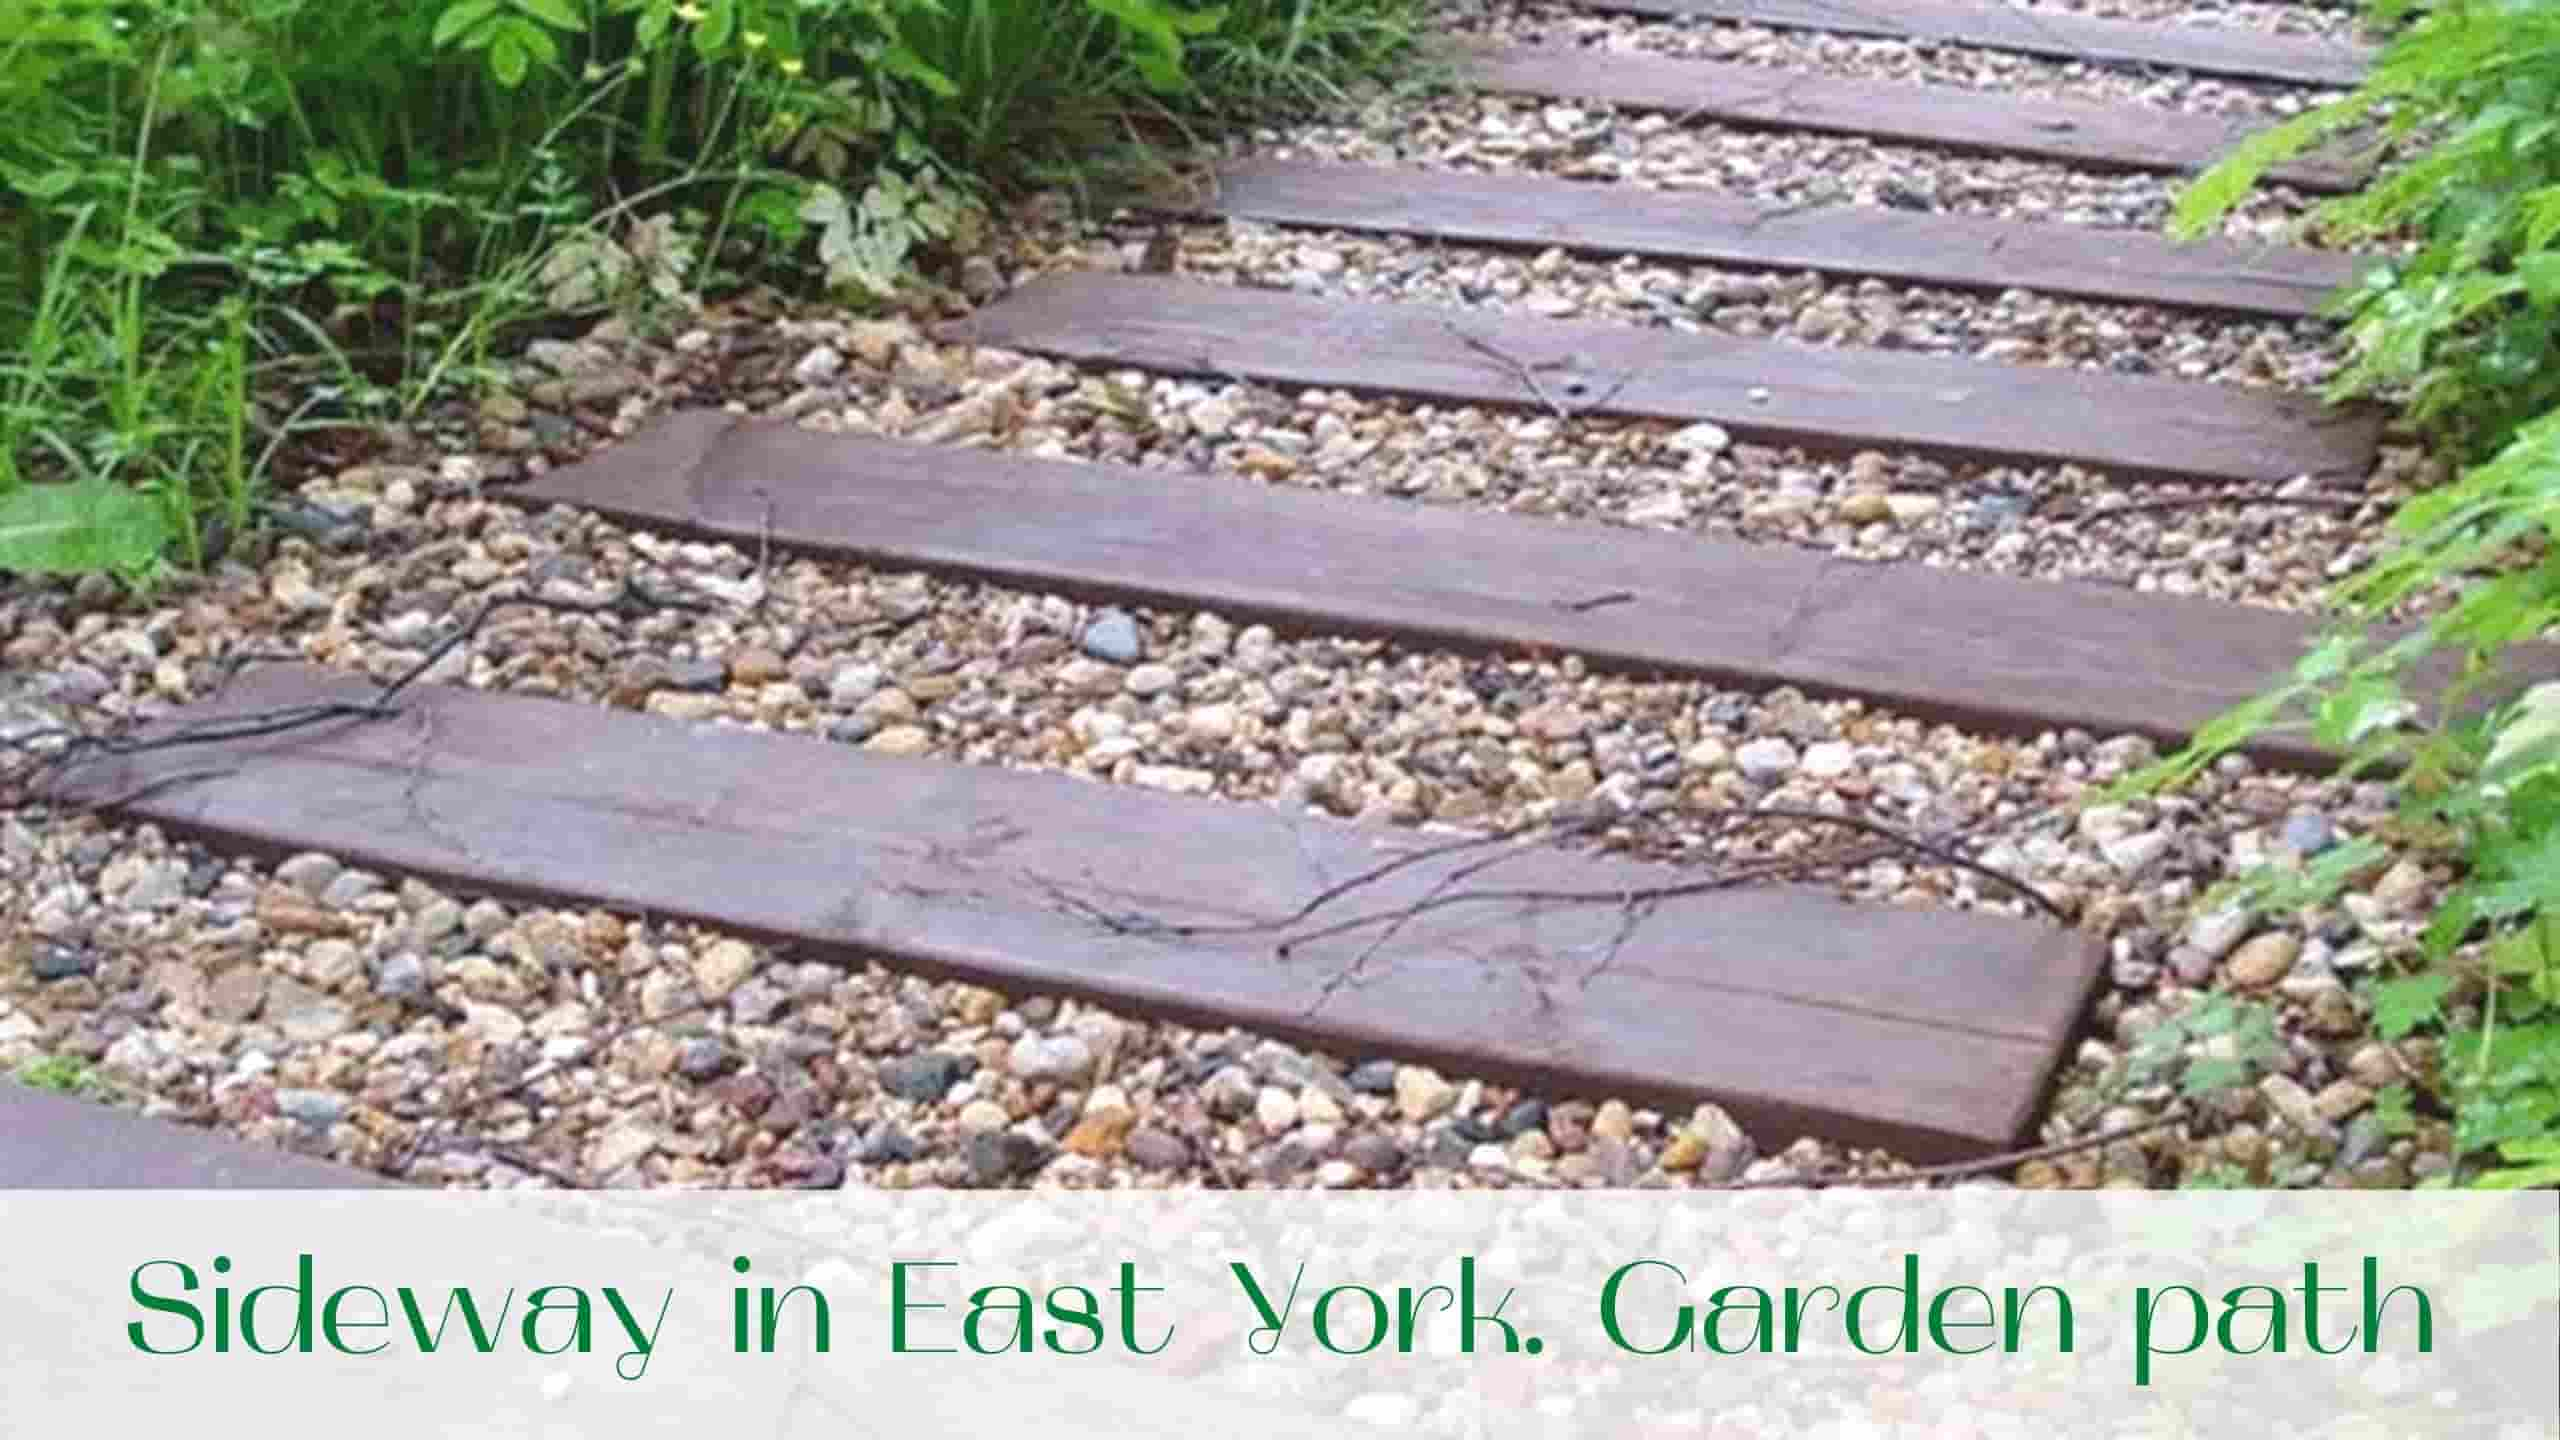 image-Garden-path-in-east-york